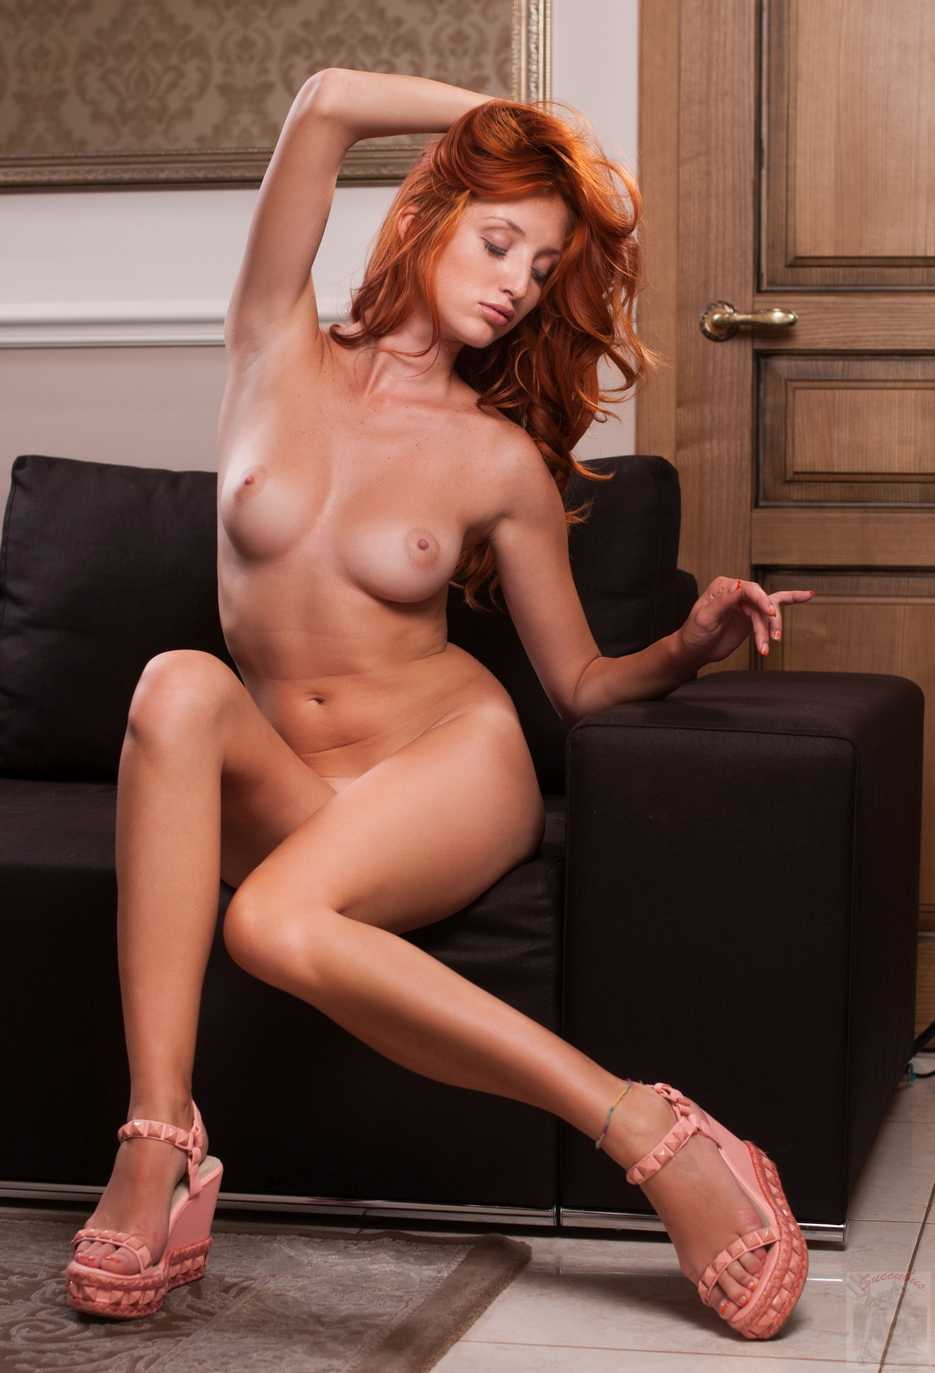 jeune fille rousse nue (121)